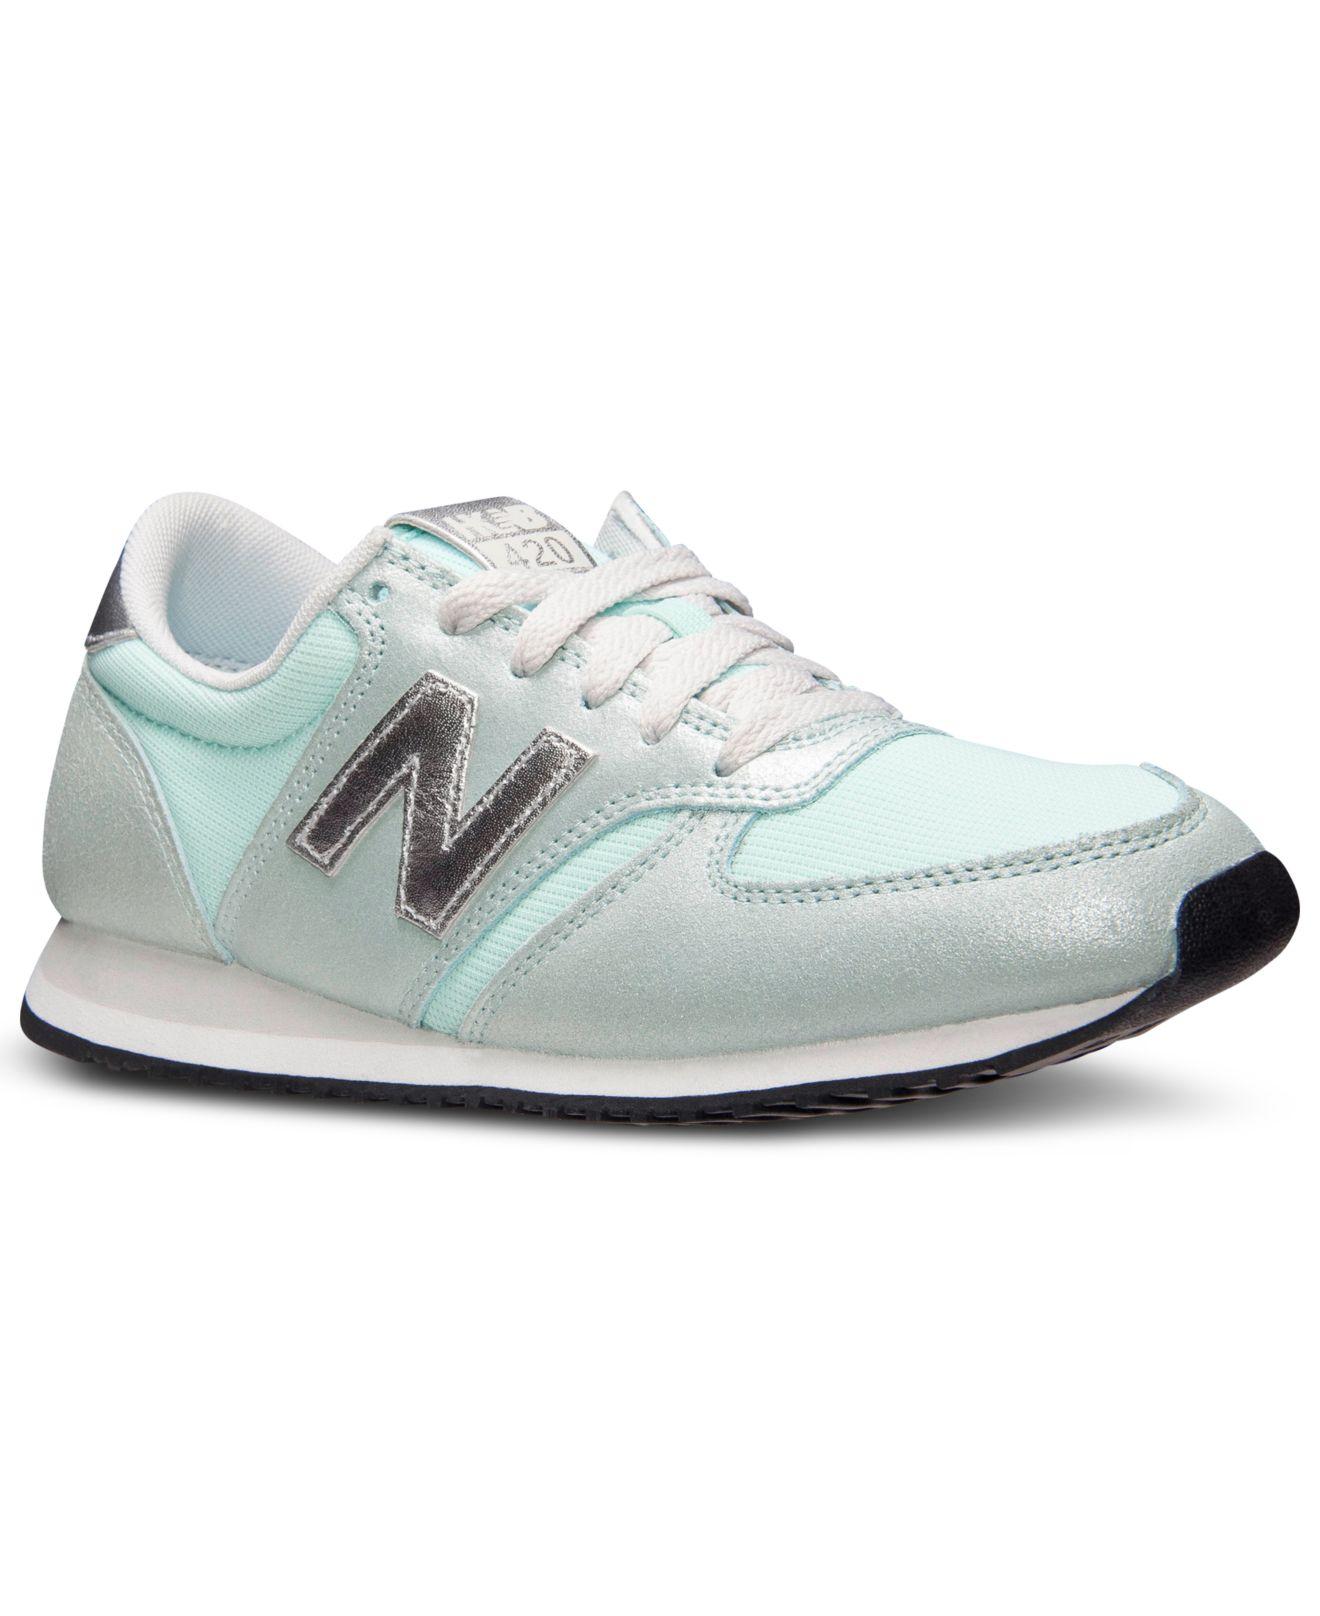 new balance women's heidi klum 420 casual sneakers